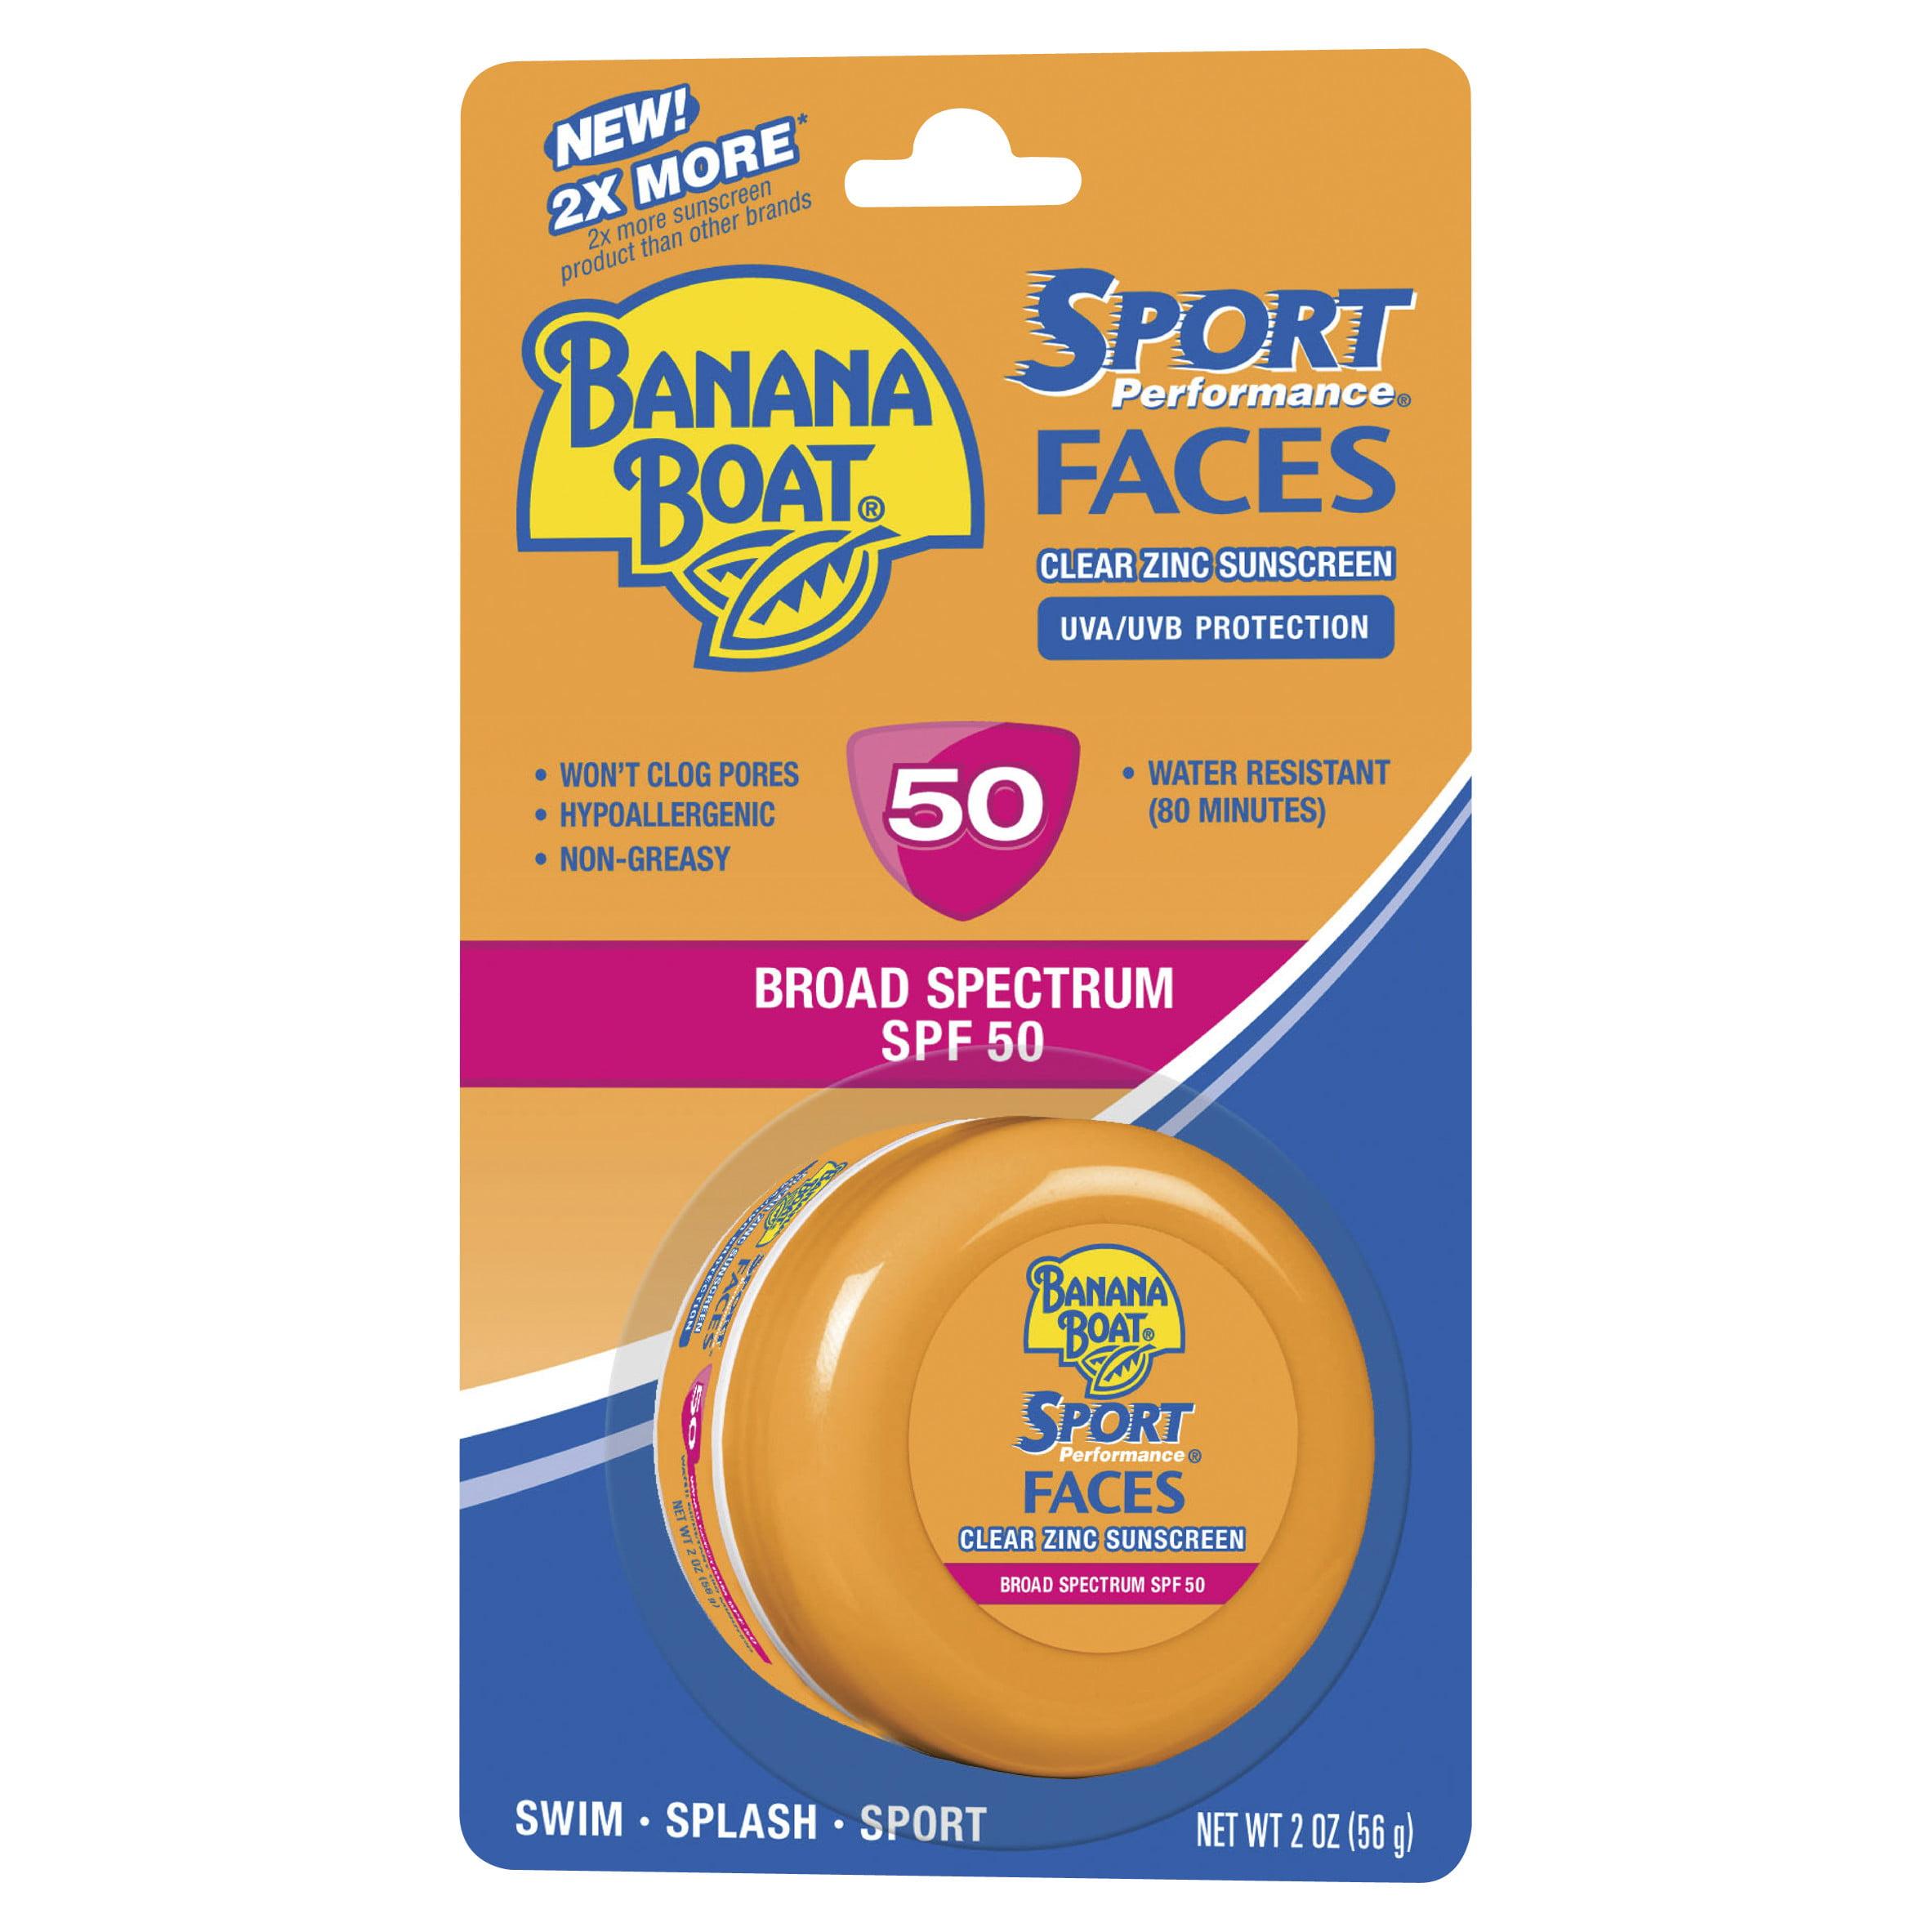 Banana Boat Sport Performance Faces Clear Zinc Sunscreen Lotion SPF 50, 2 Oz Jar